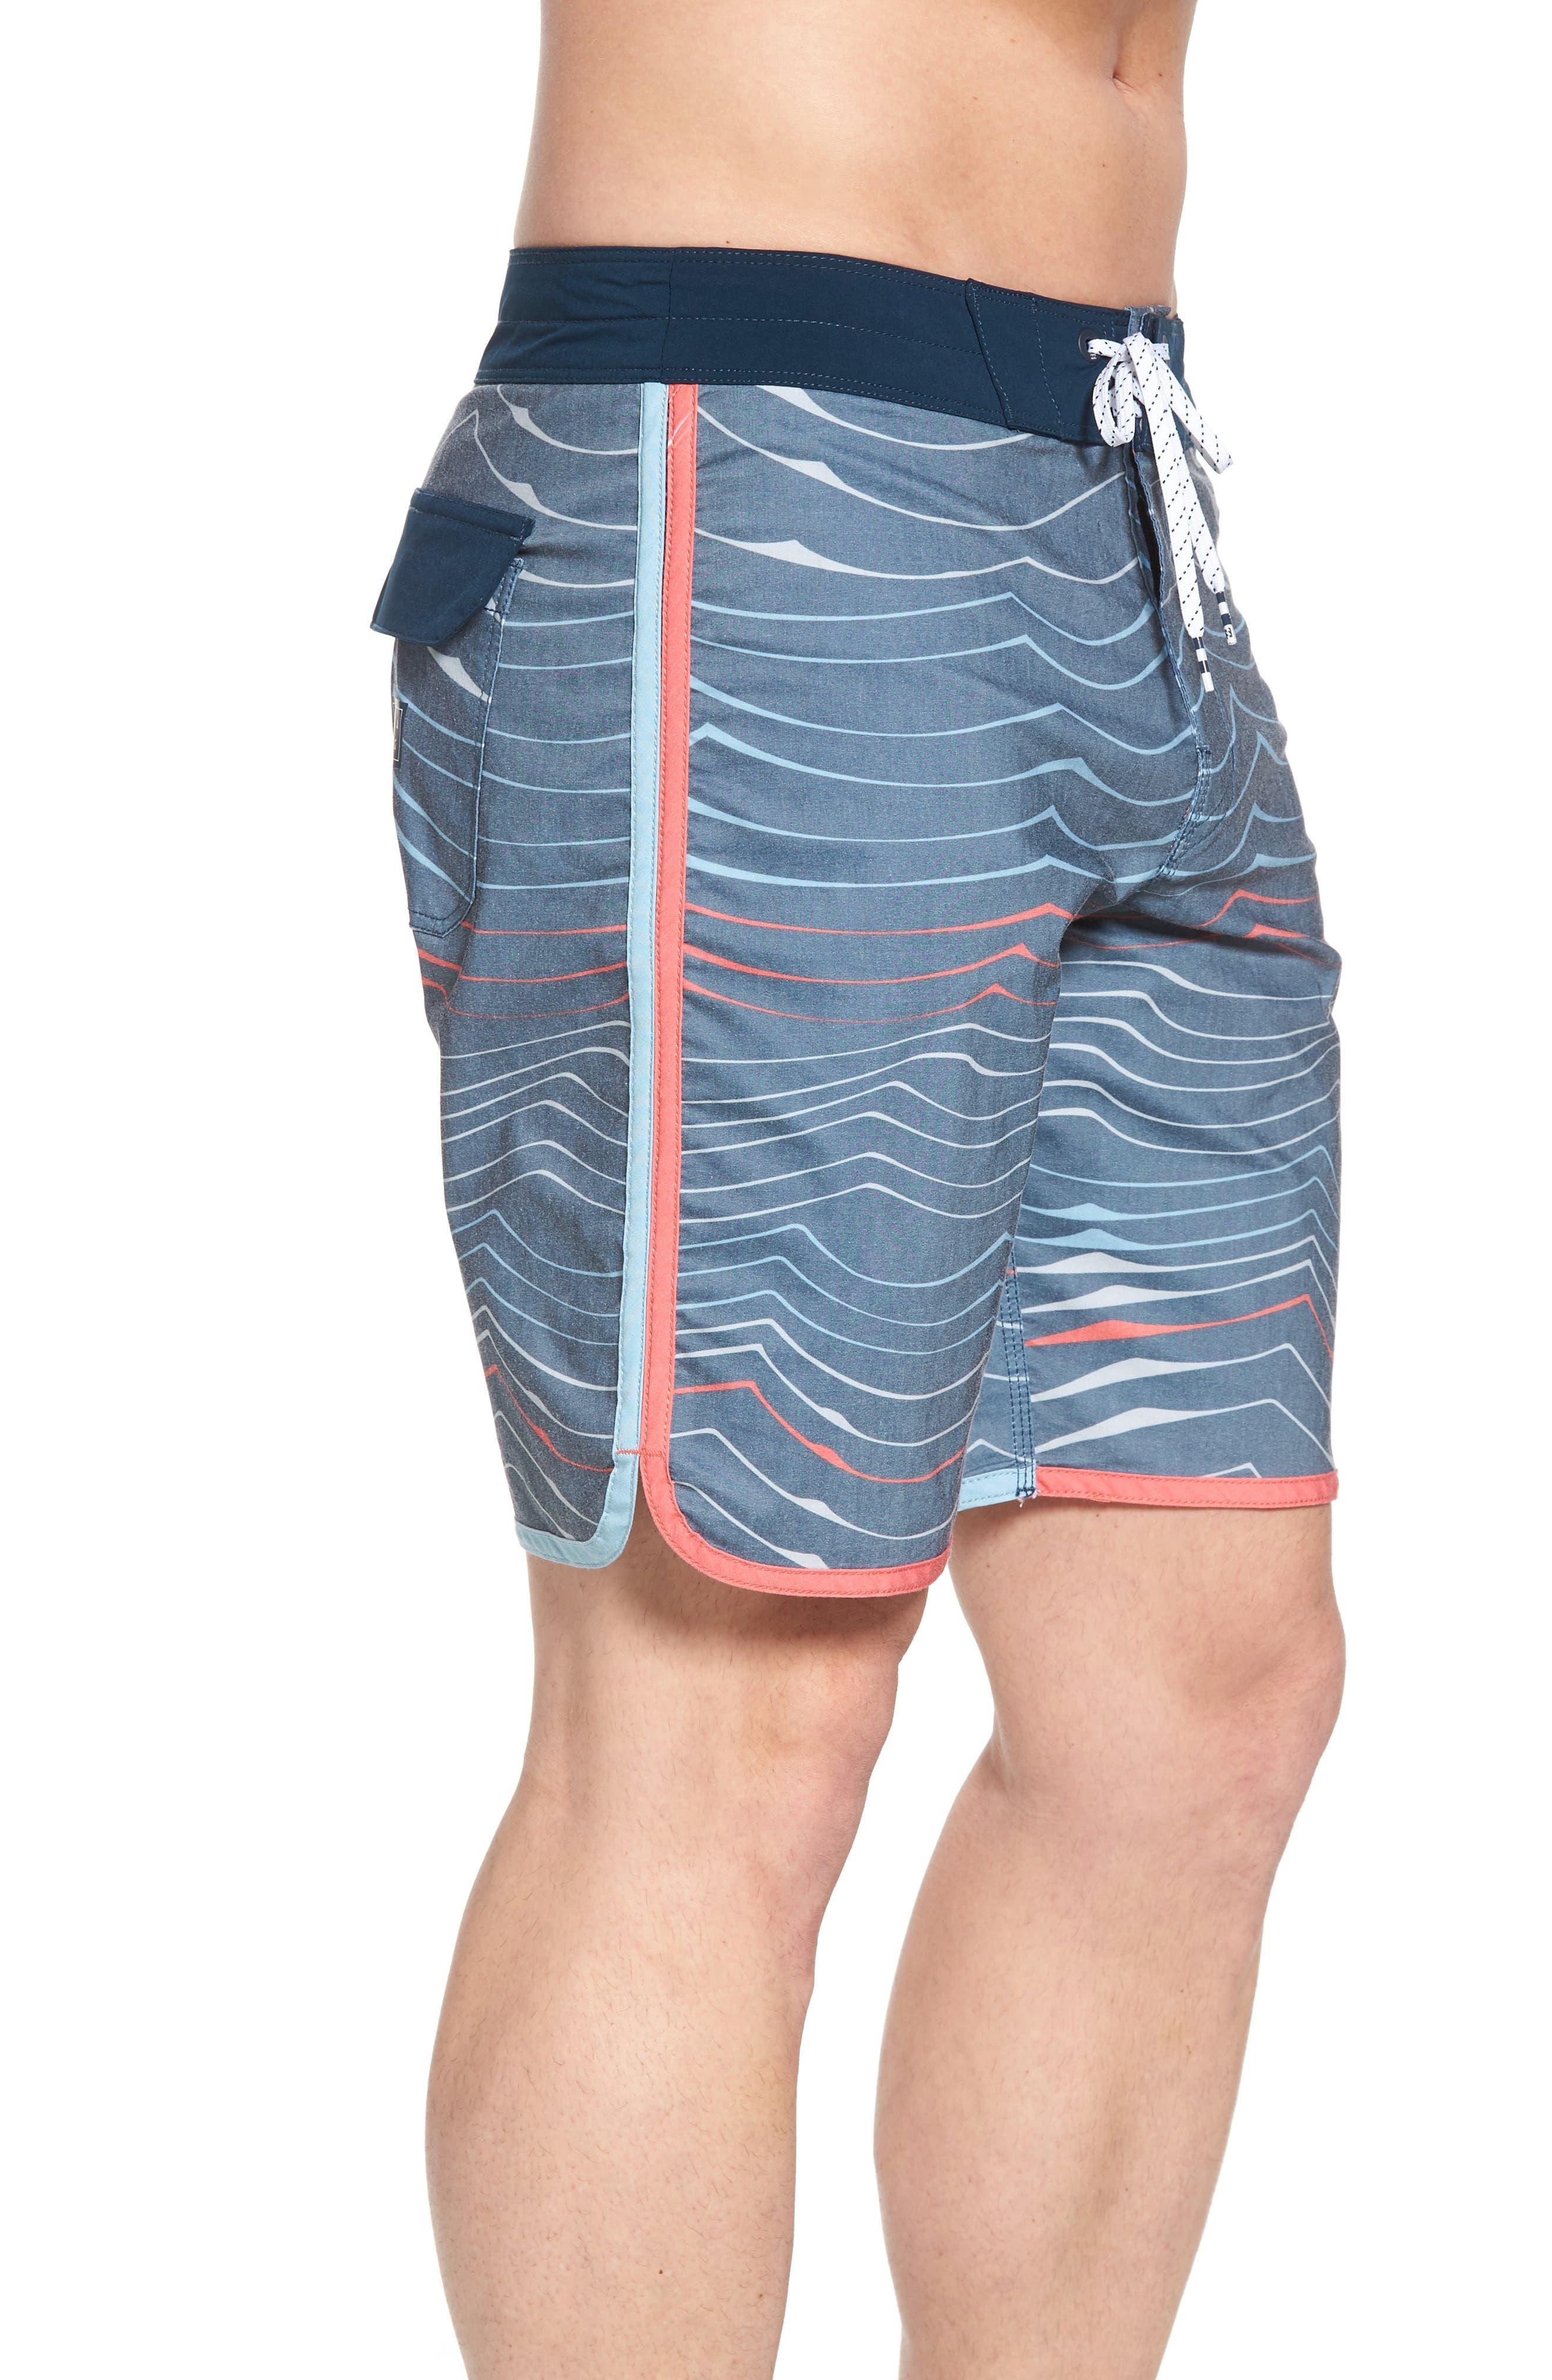 73 X Lineup Board Shorts,                             Alternate thumbnail 4, color,                             Navy